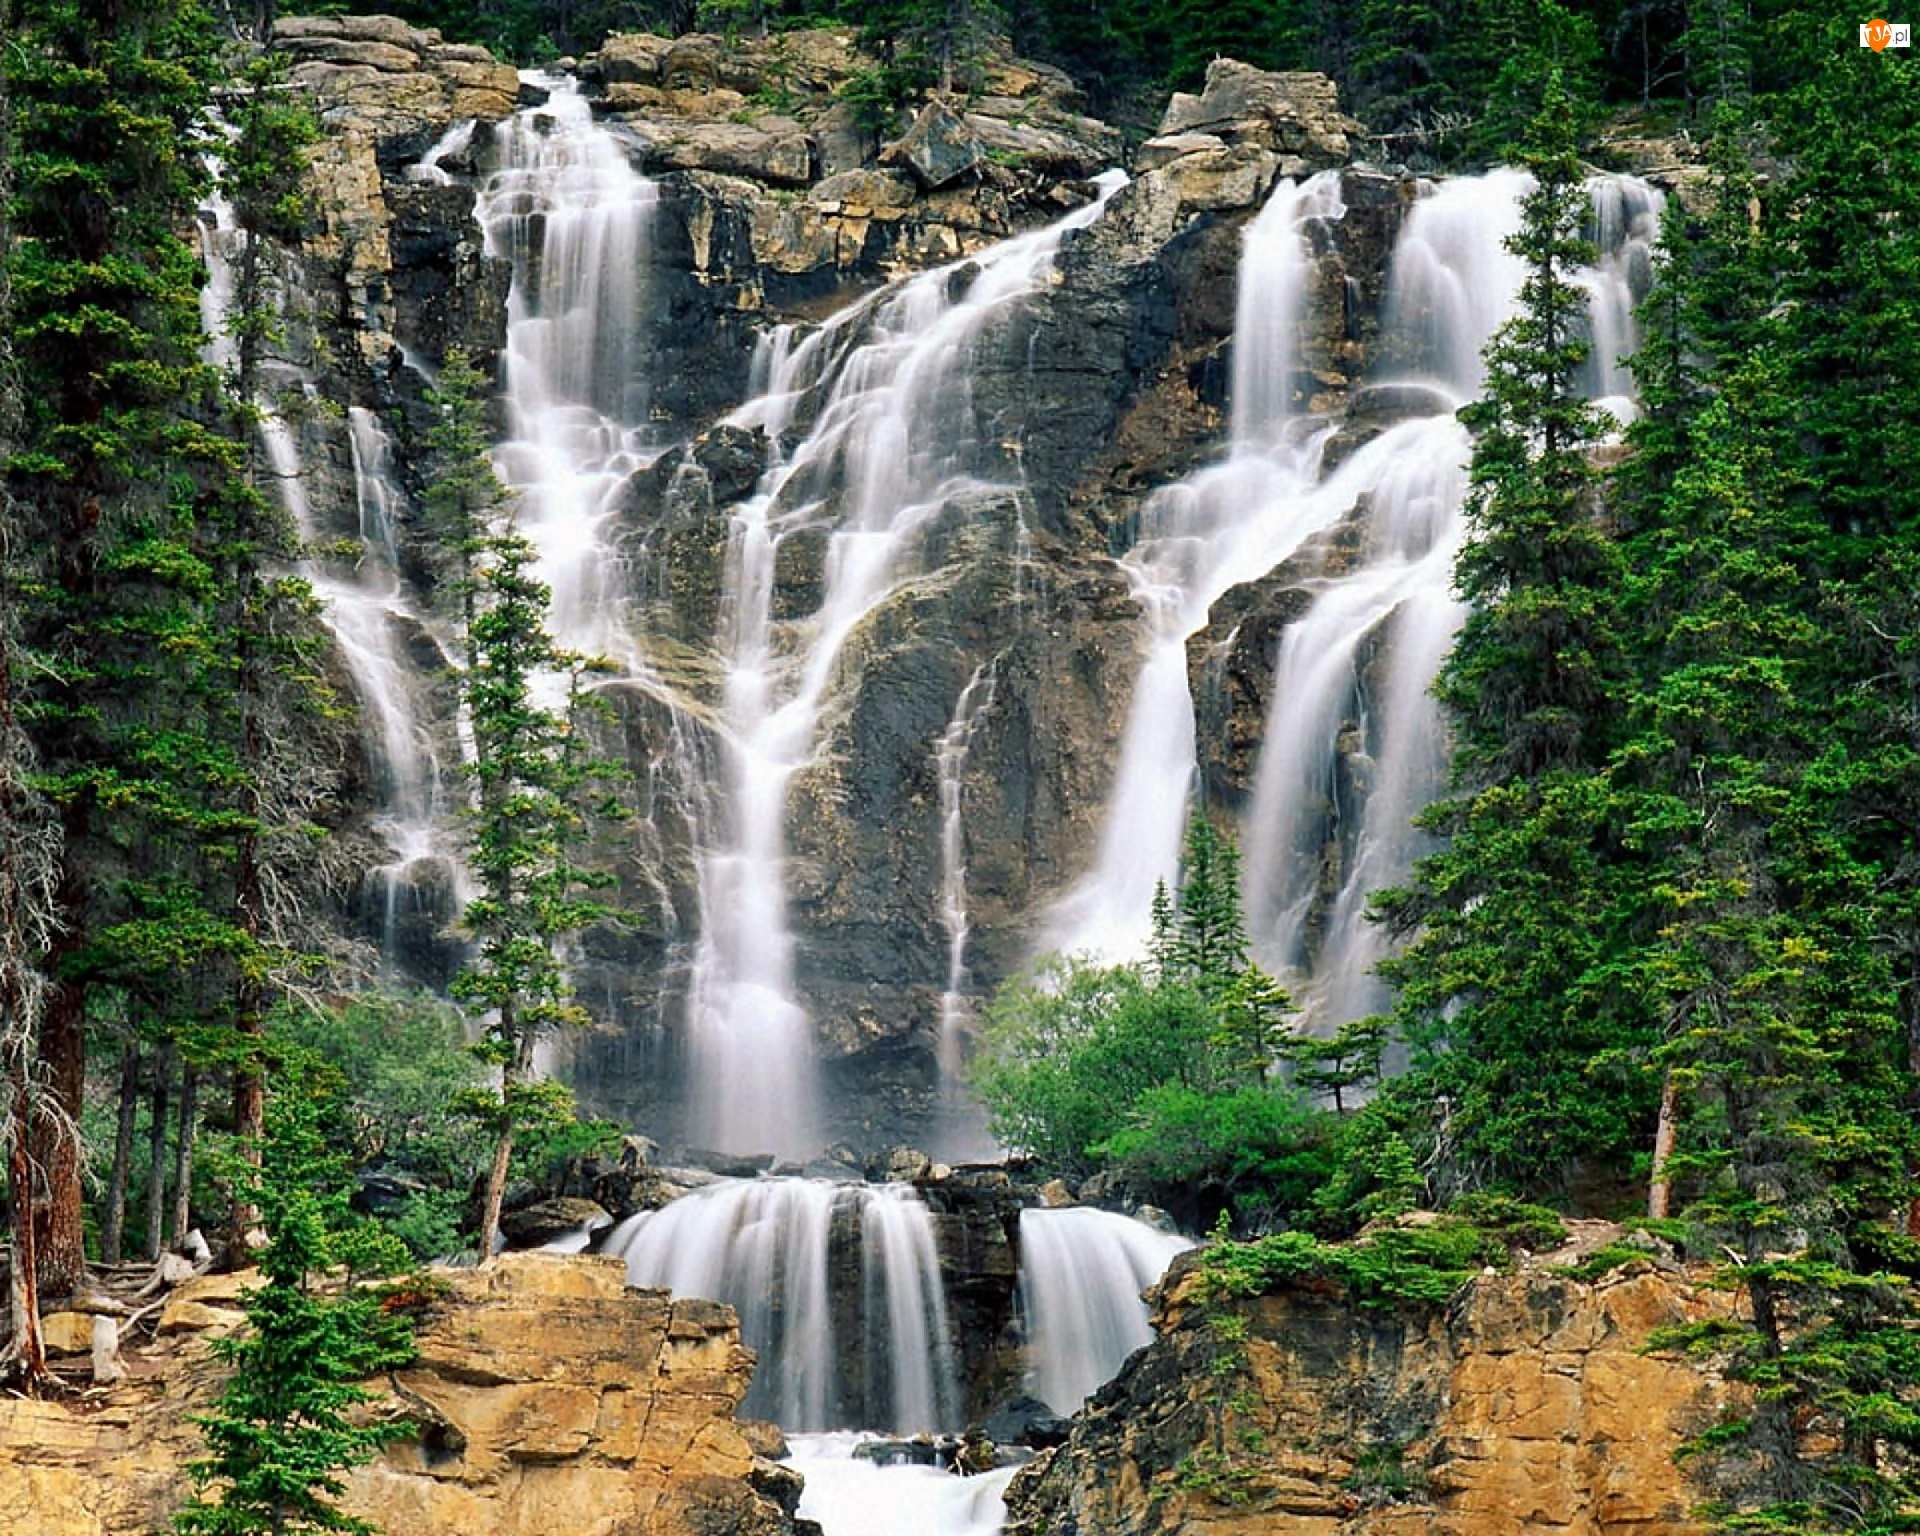 Kanada, Wodospad Tangle Creek Falls, Park Narodowy Jasper, Prowincja Alberta